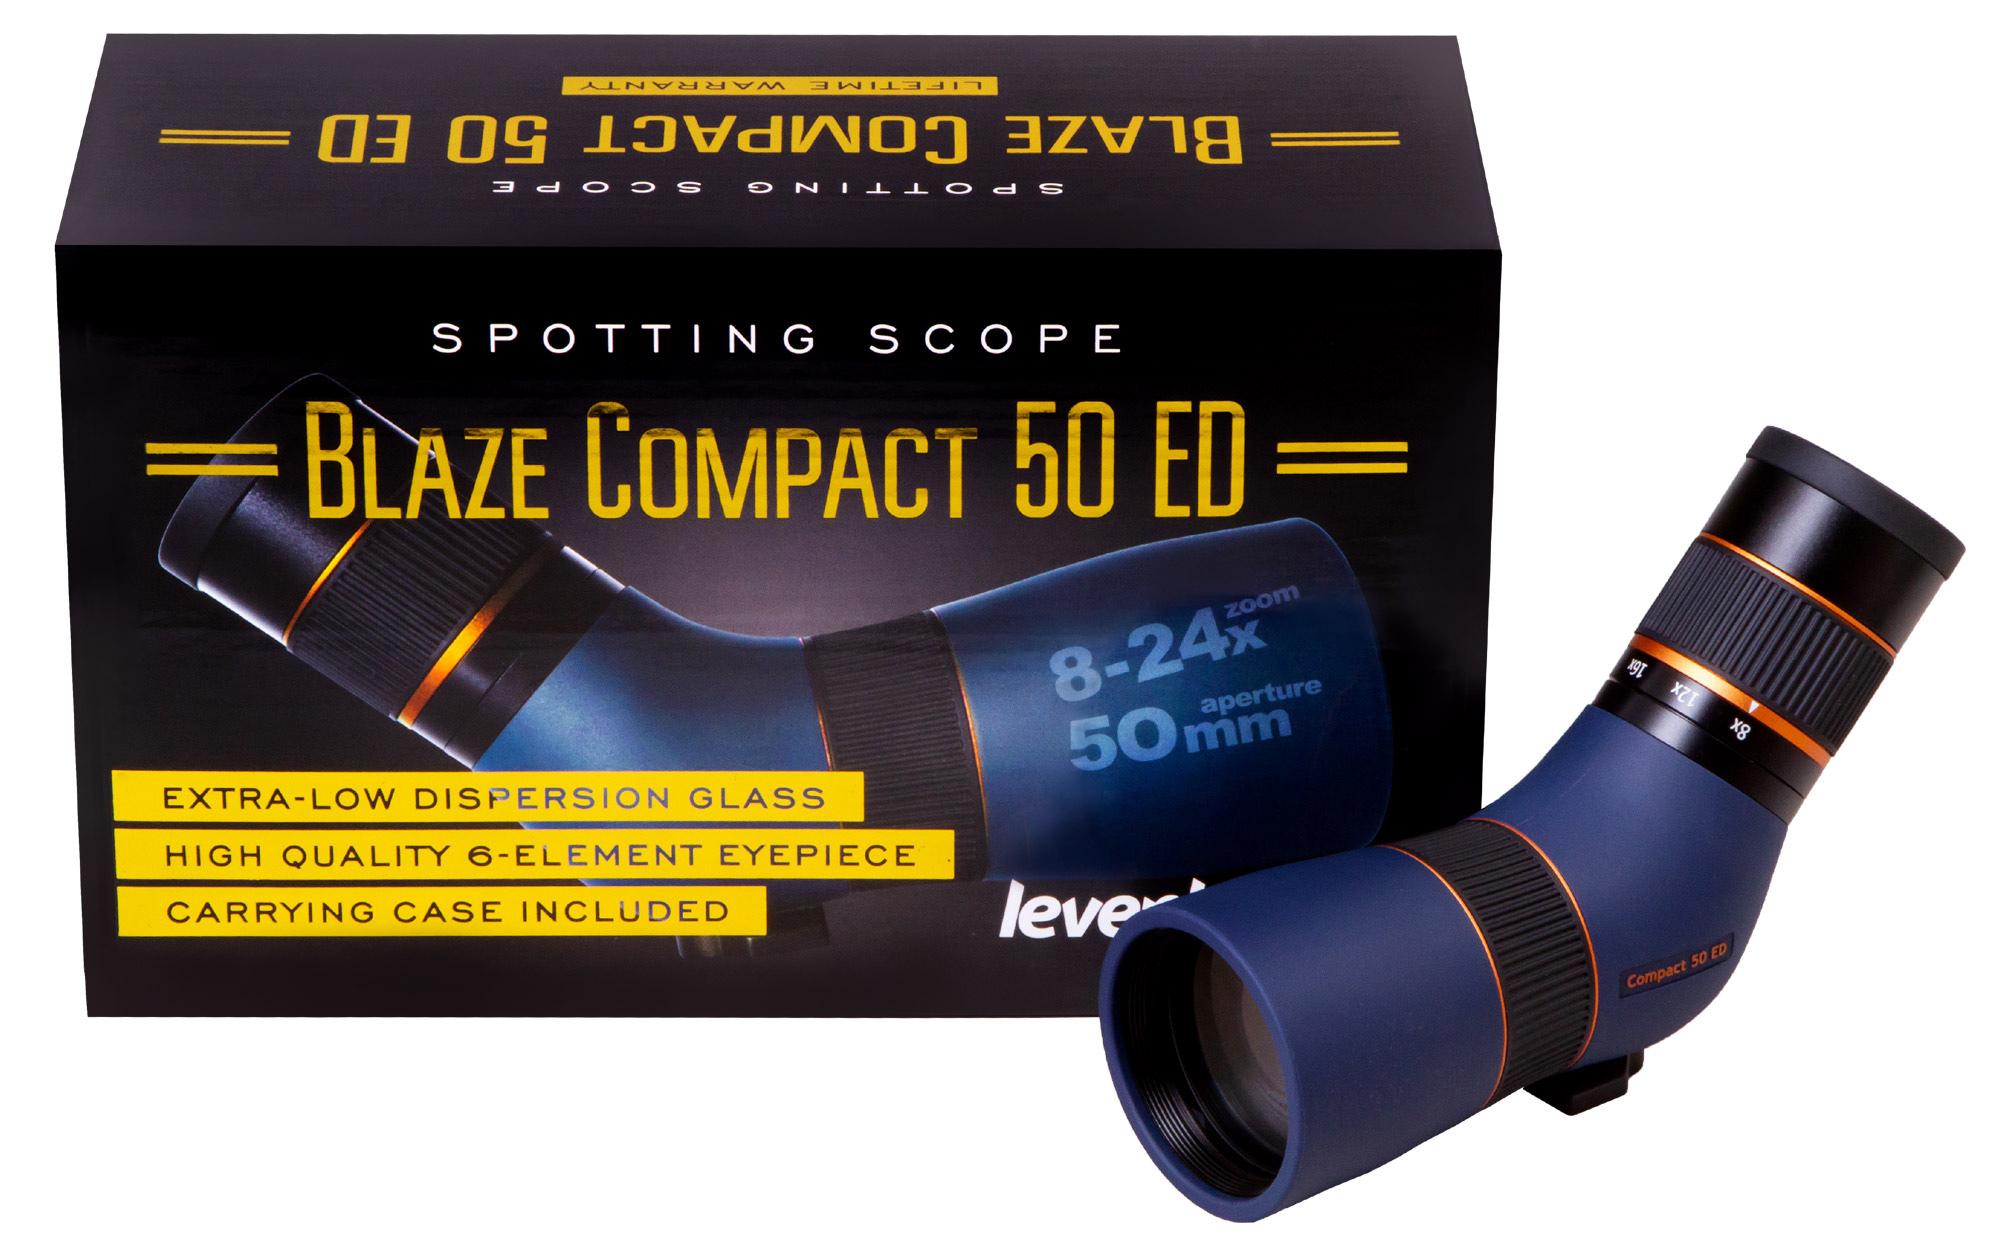 74161_levenhuk-spotting-scope-blaze-compact-50-ed_15.jpg